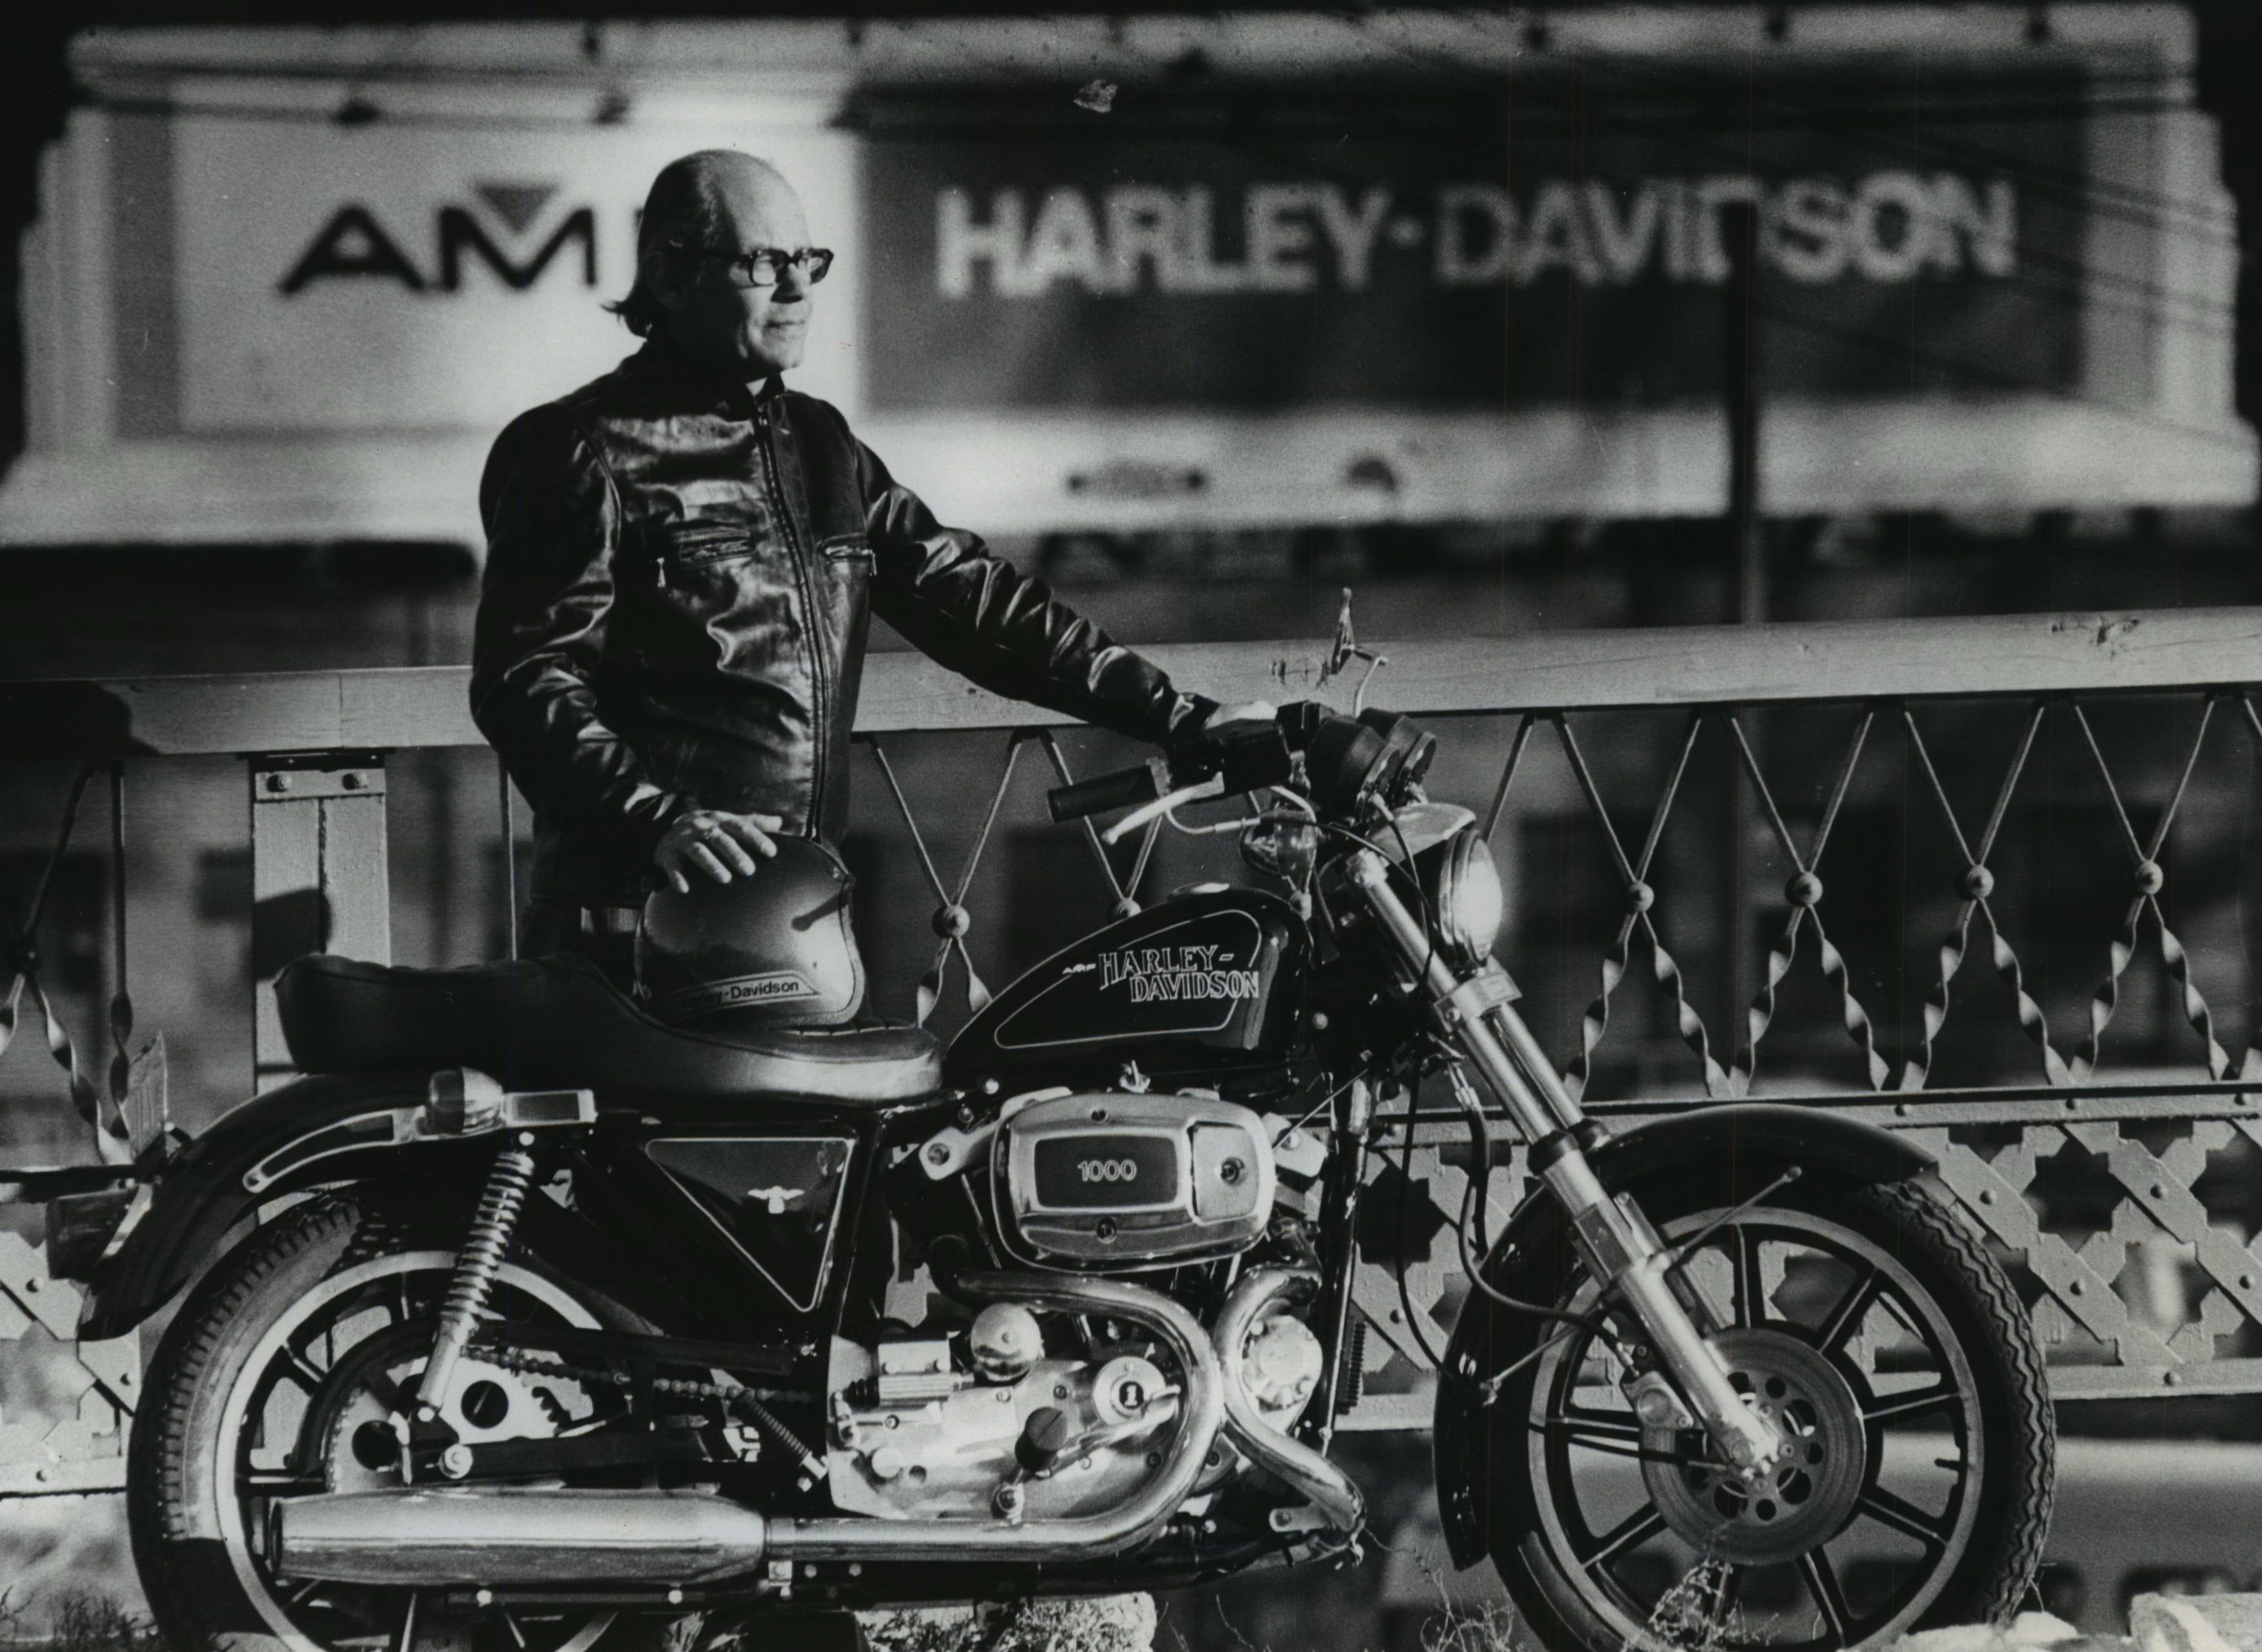 Harley Davidson 1978